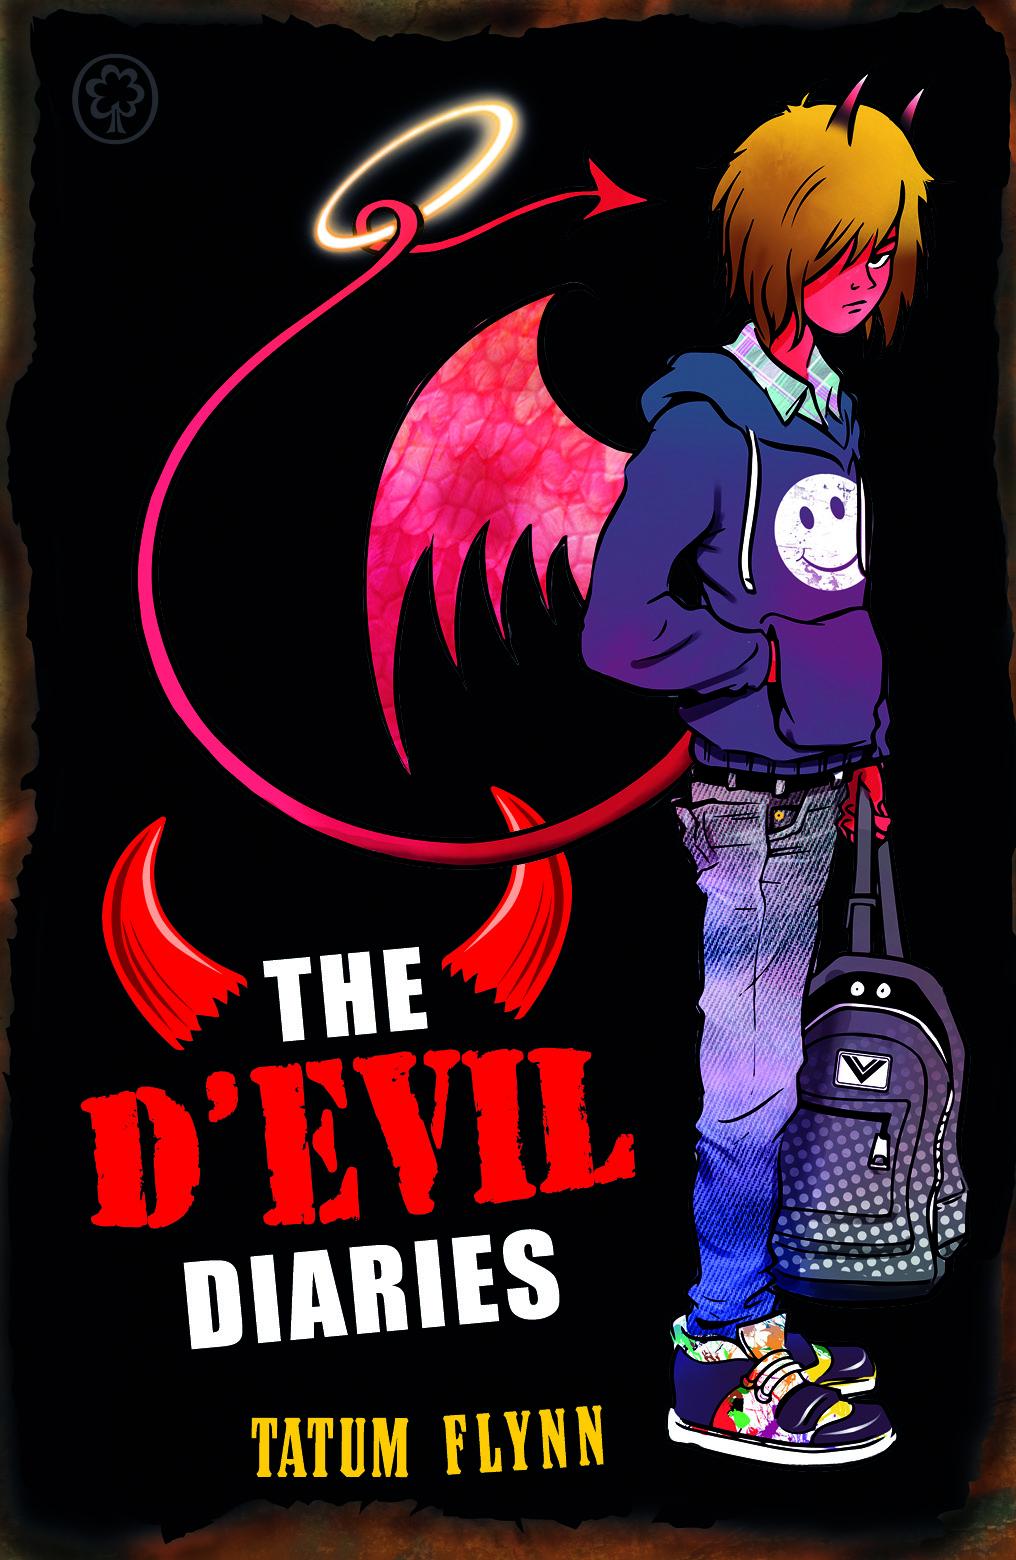 D'Evil_Diaries_cover